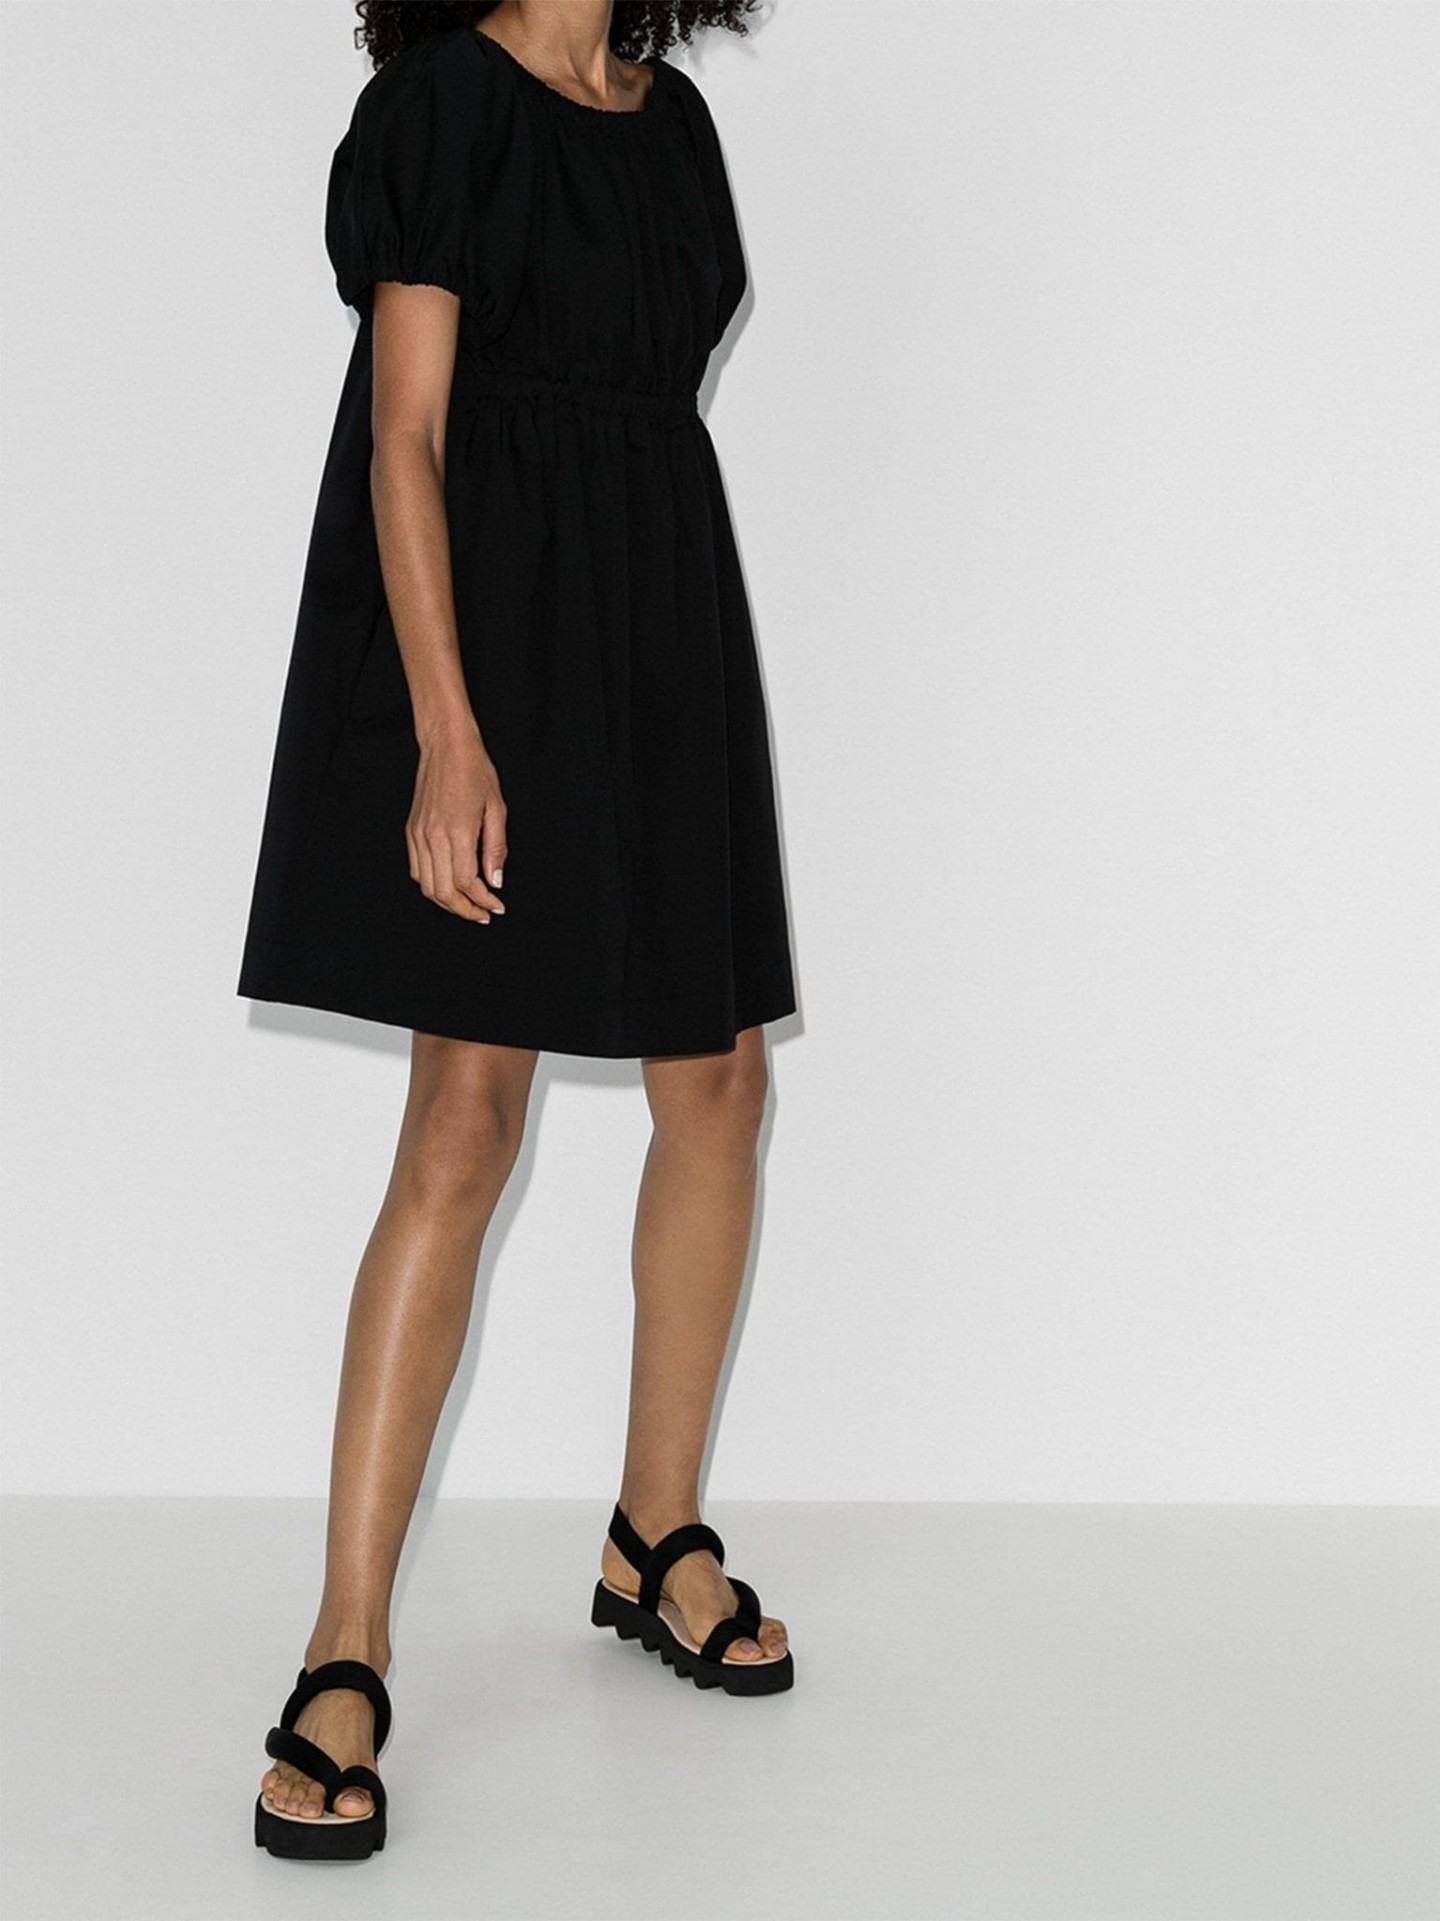 MOLLY GODDARD Honey Off-The-Shoulder Gathered Mini Dress